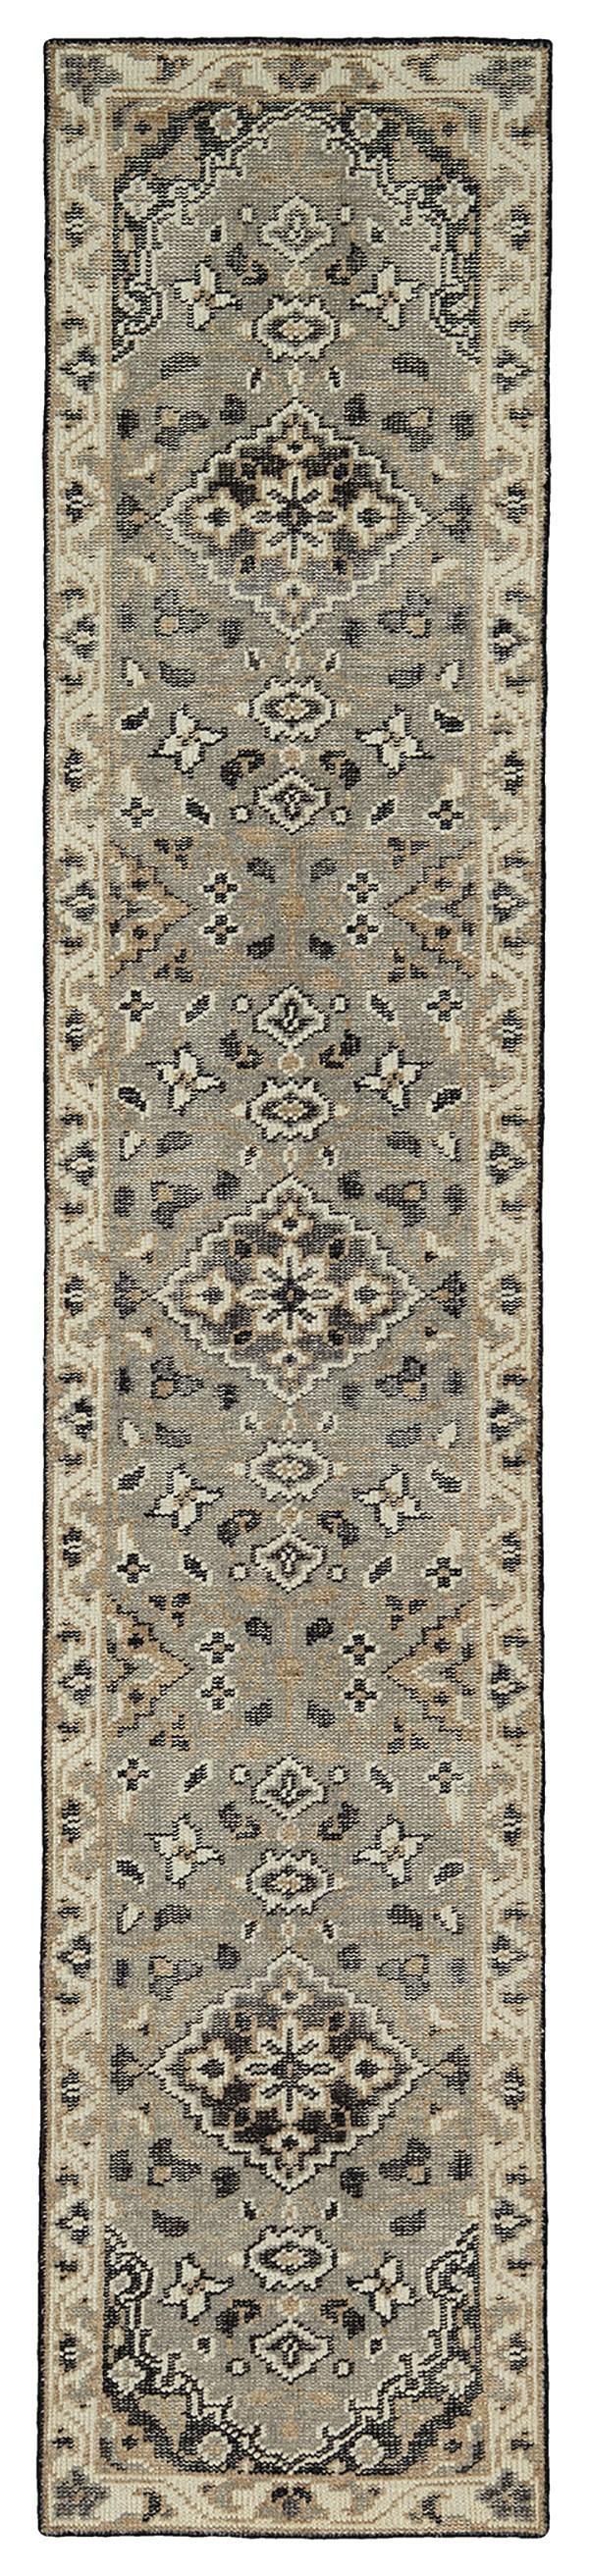 Grey (75) Traditional / Oriental Area Rug